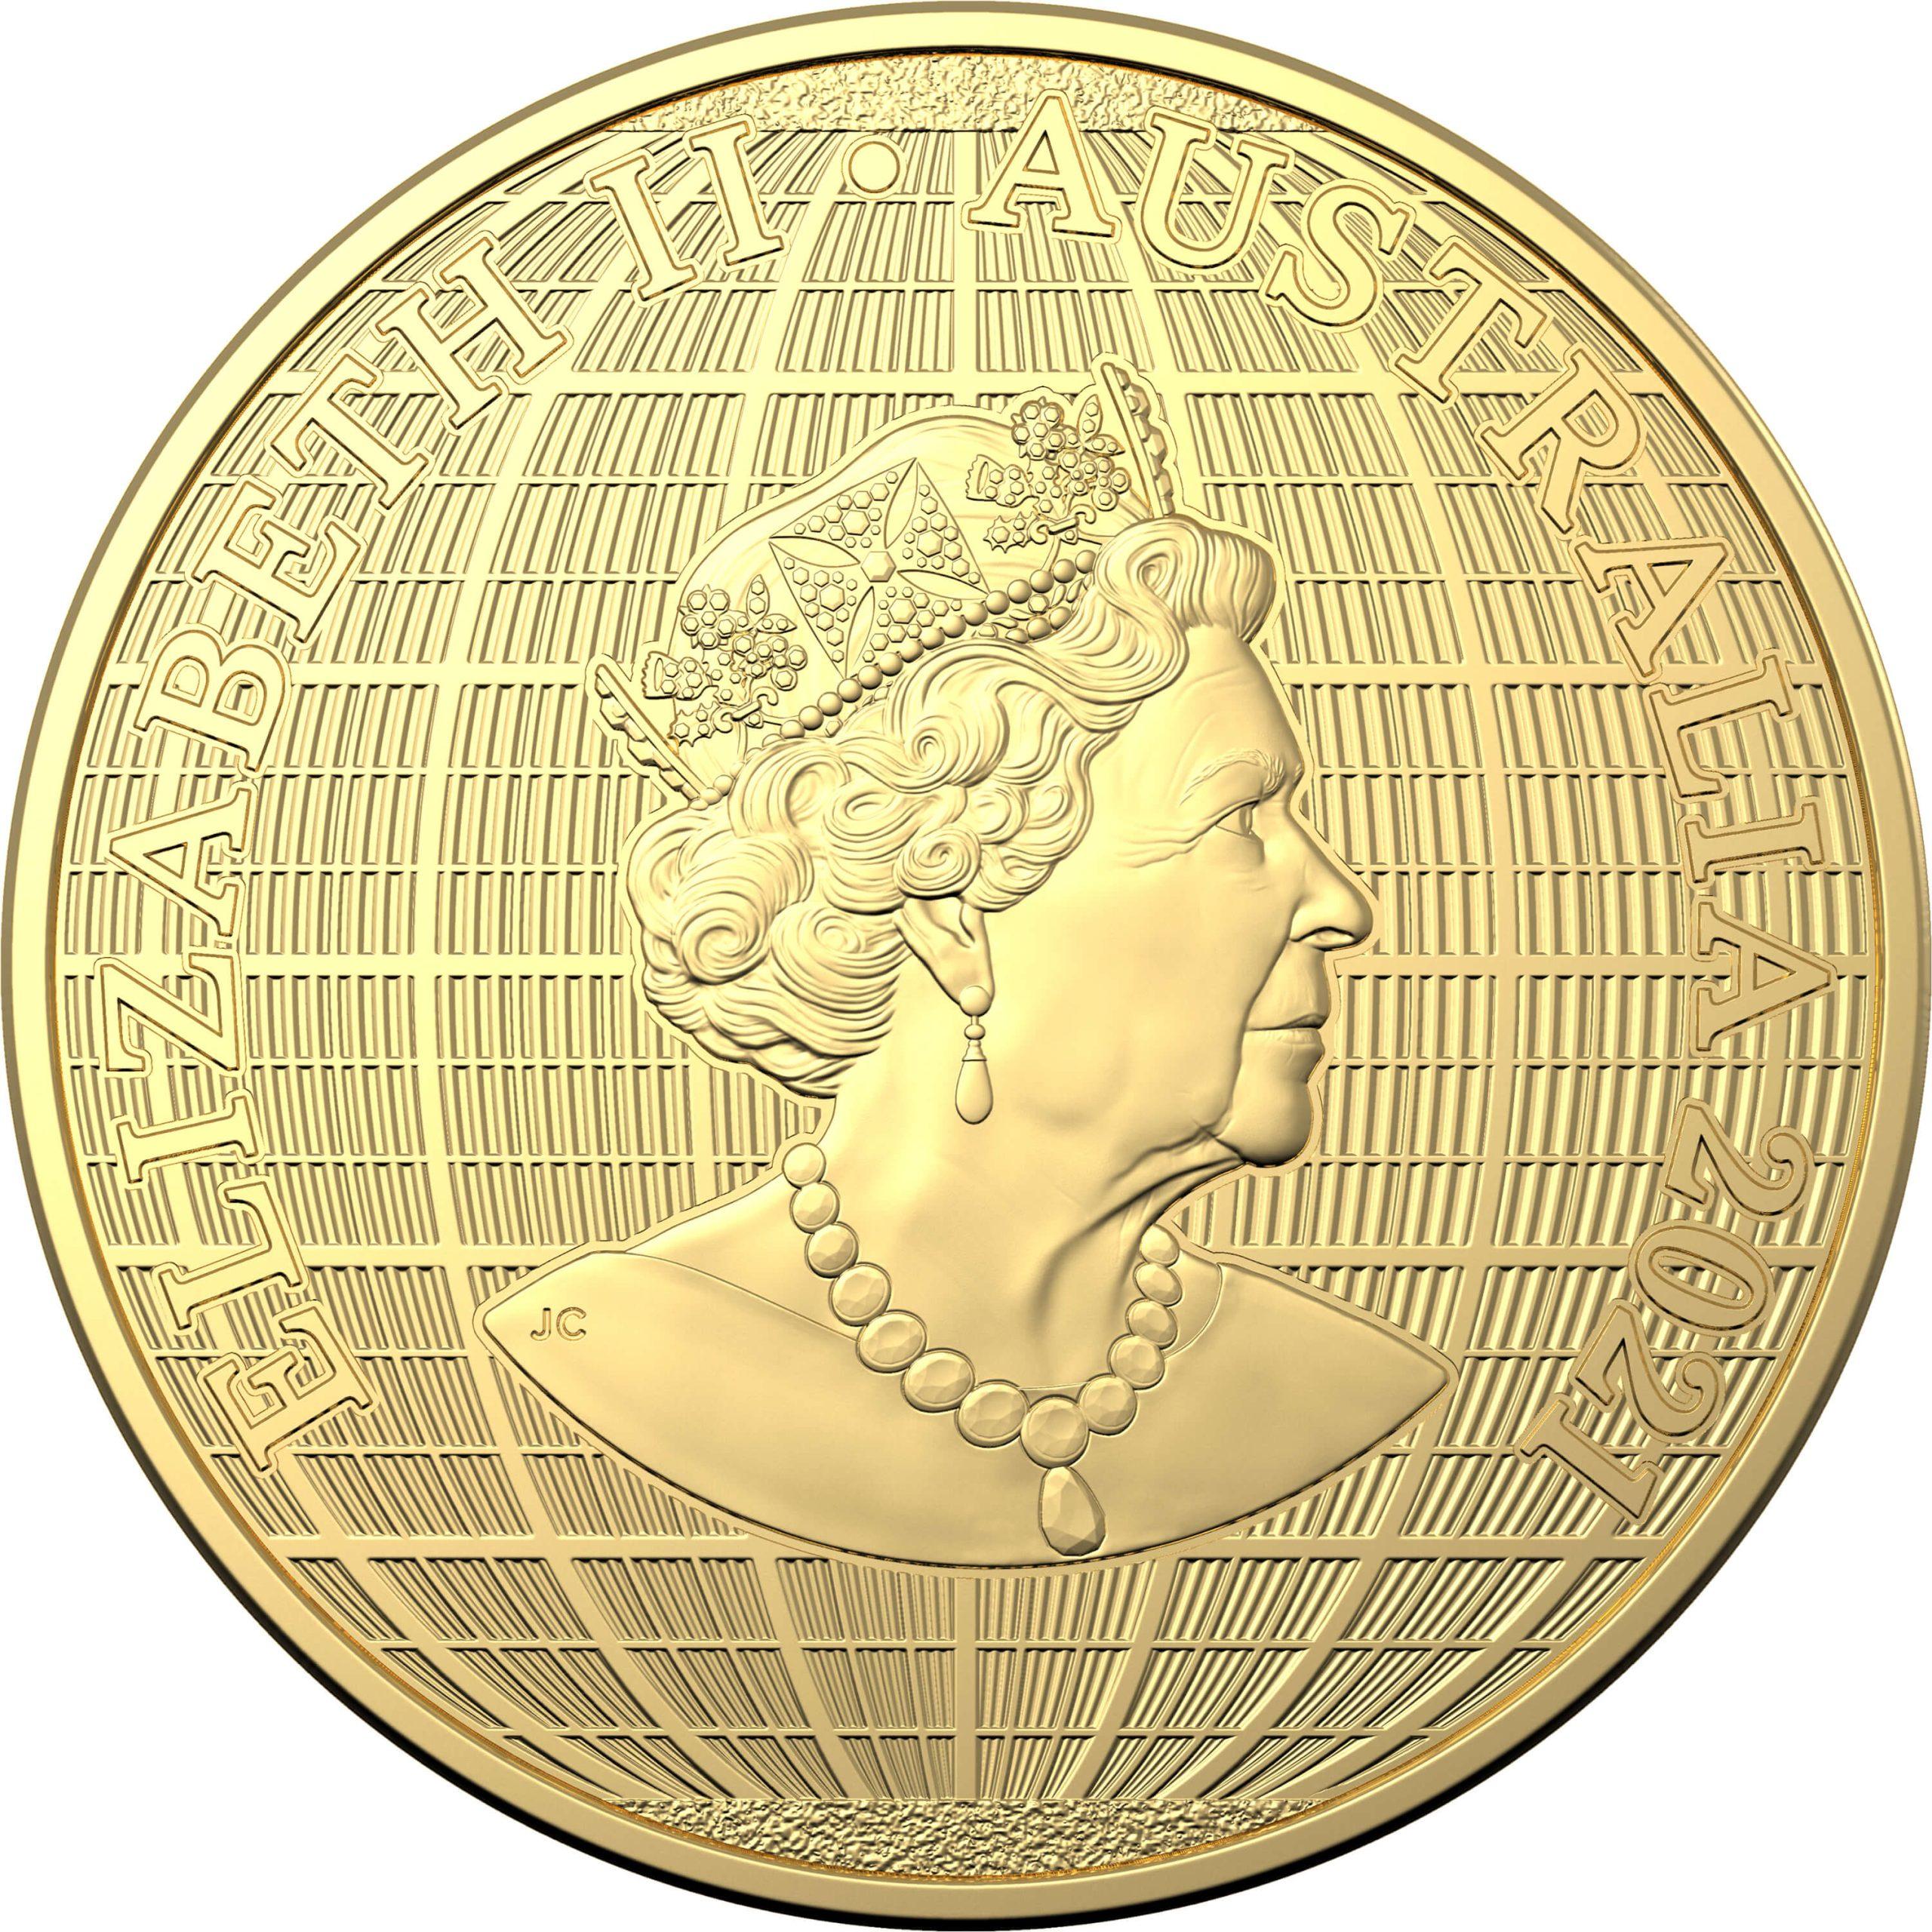 2021 $100 Beneath the Southern Skies 1oz .9999 Gold Bullion Coin - Platypus 3